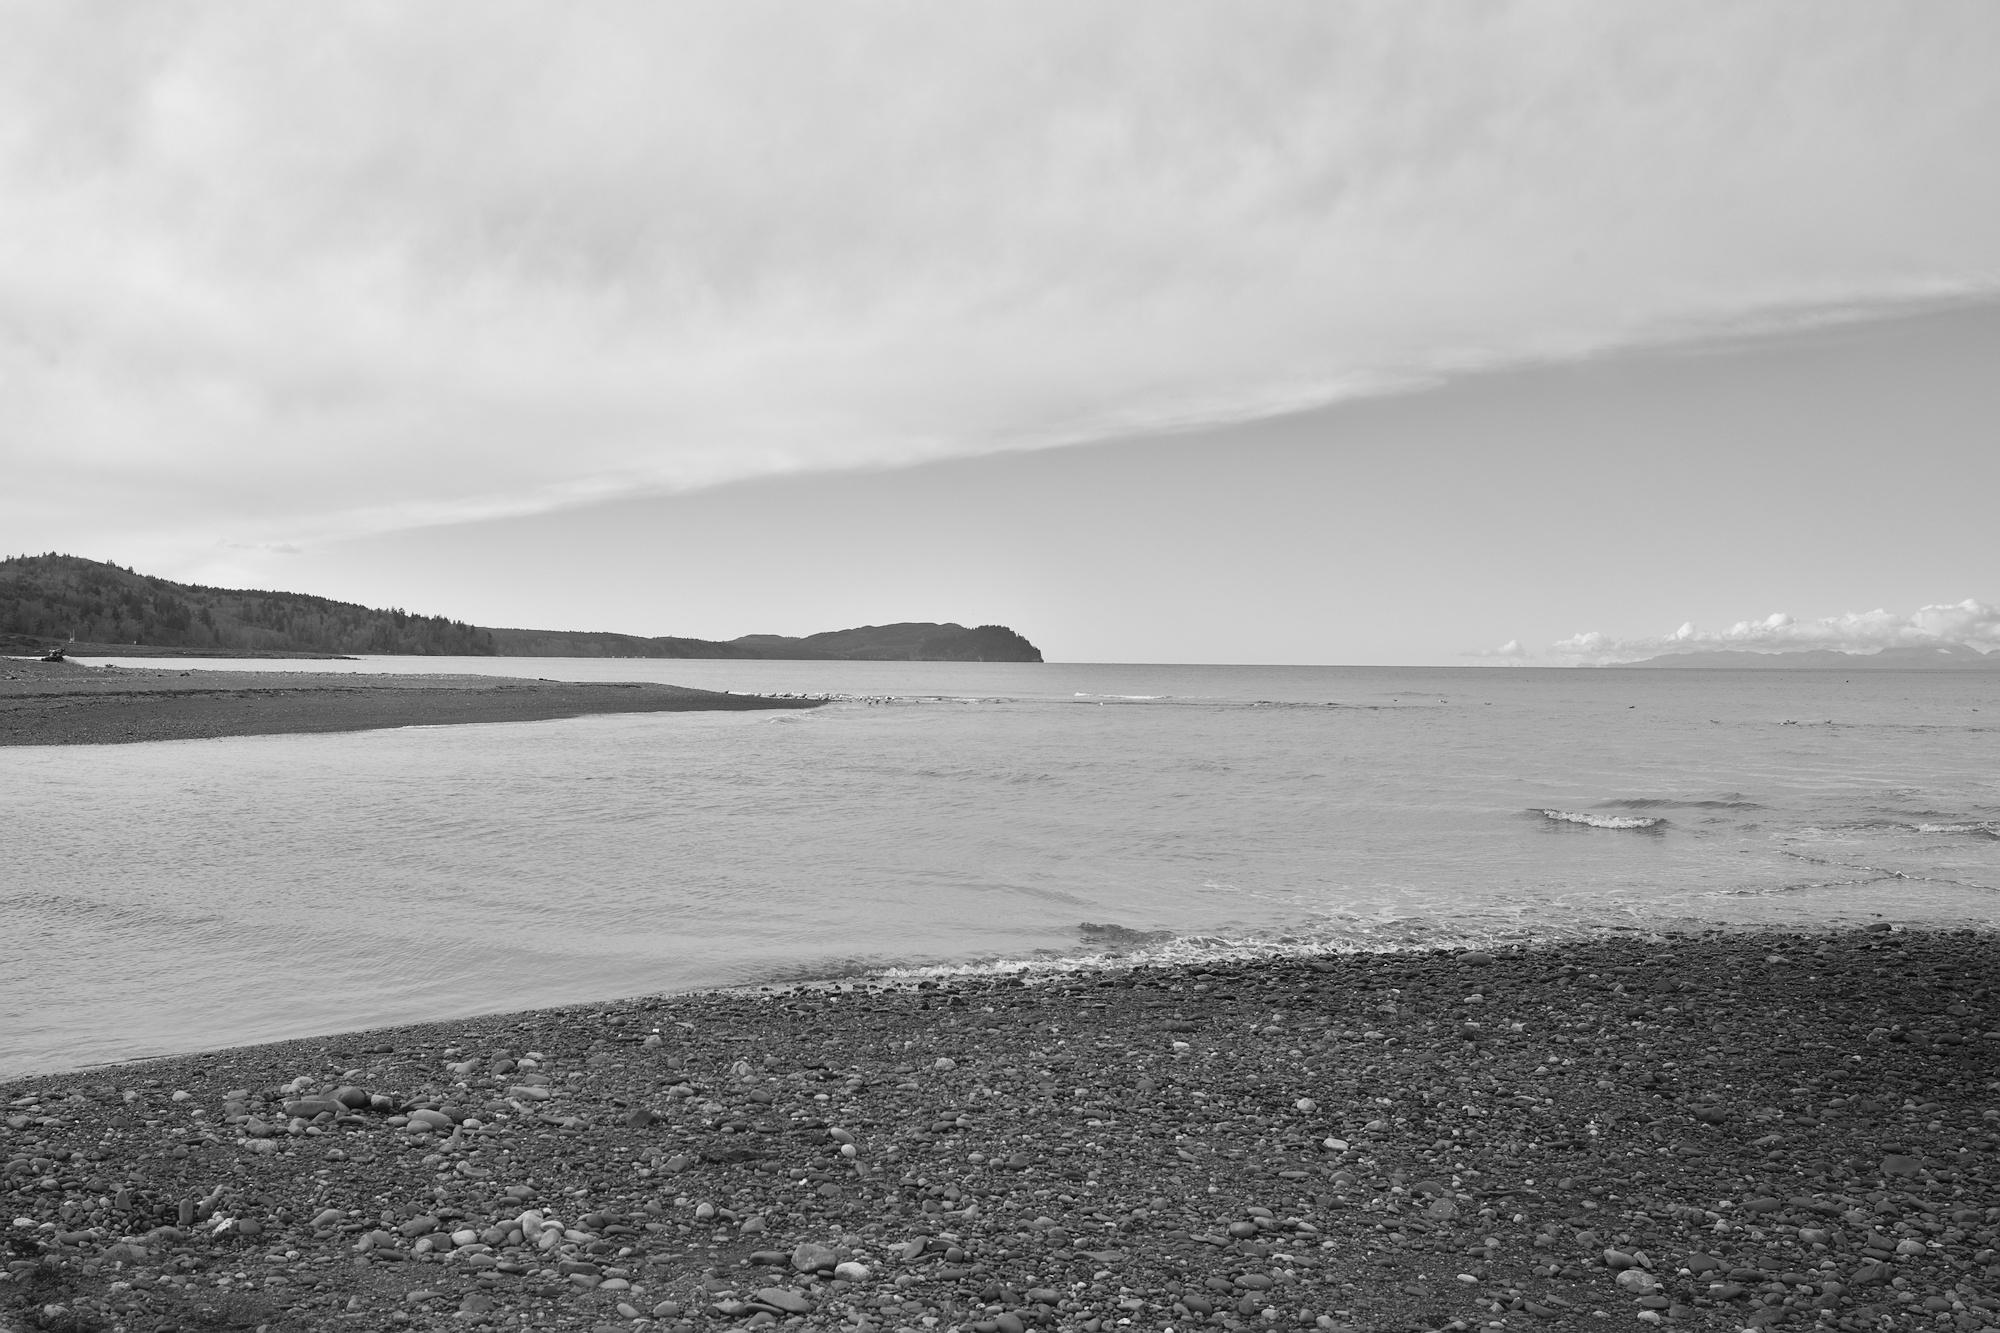 Olympic Peninsula, WA, landscapes, b&w, ocean